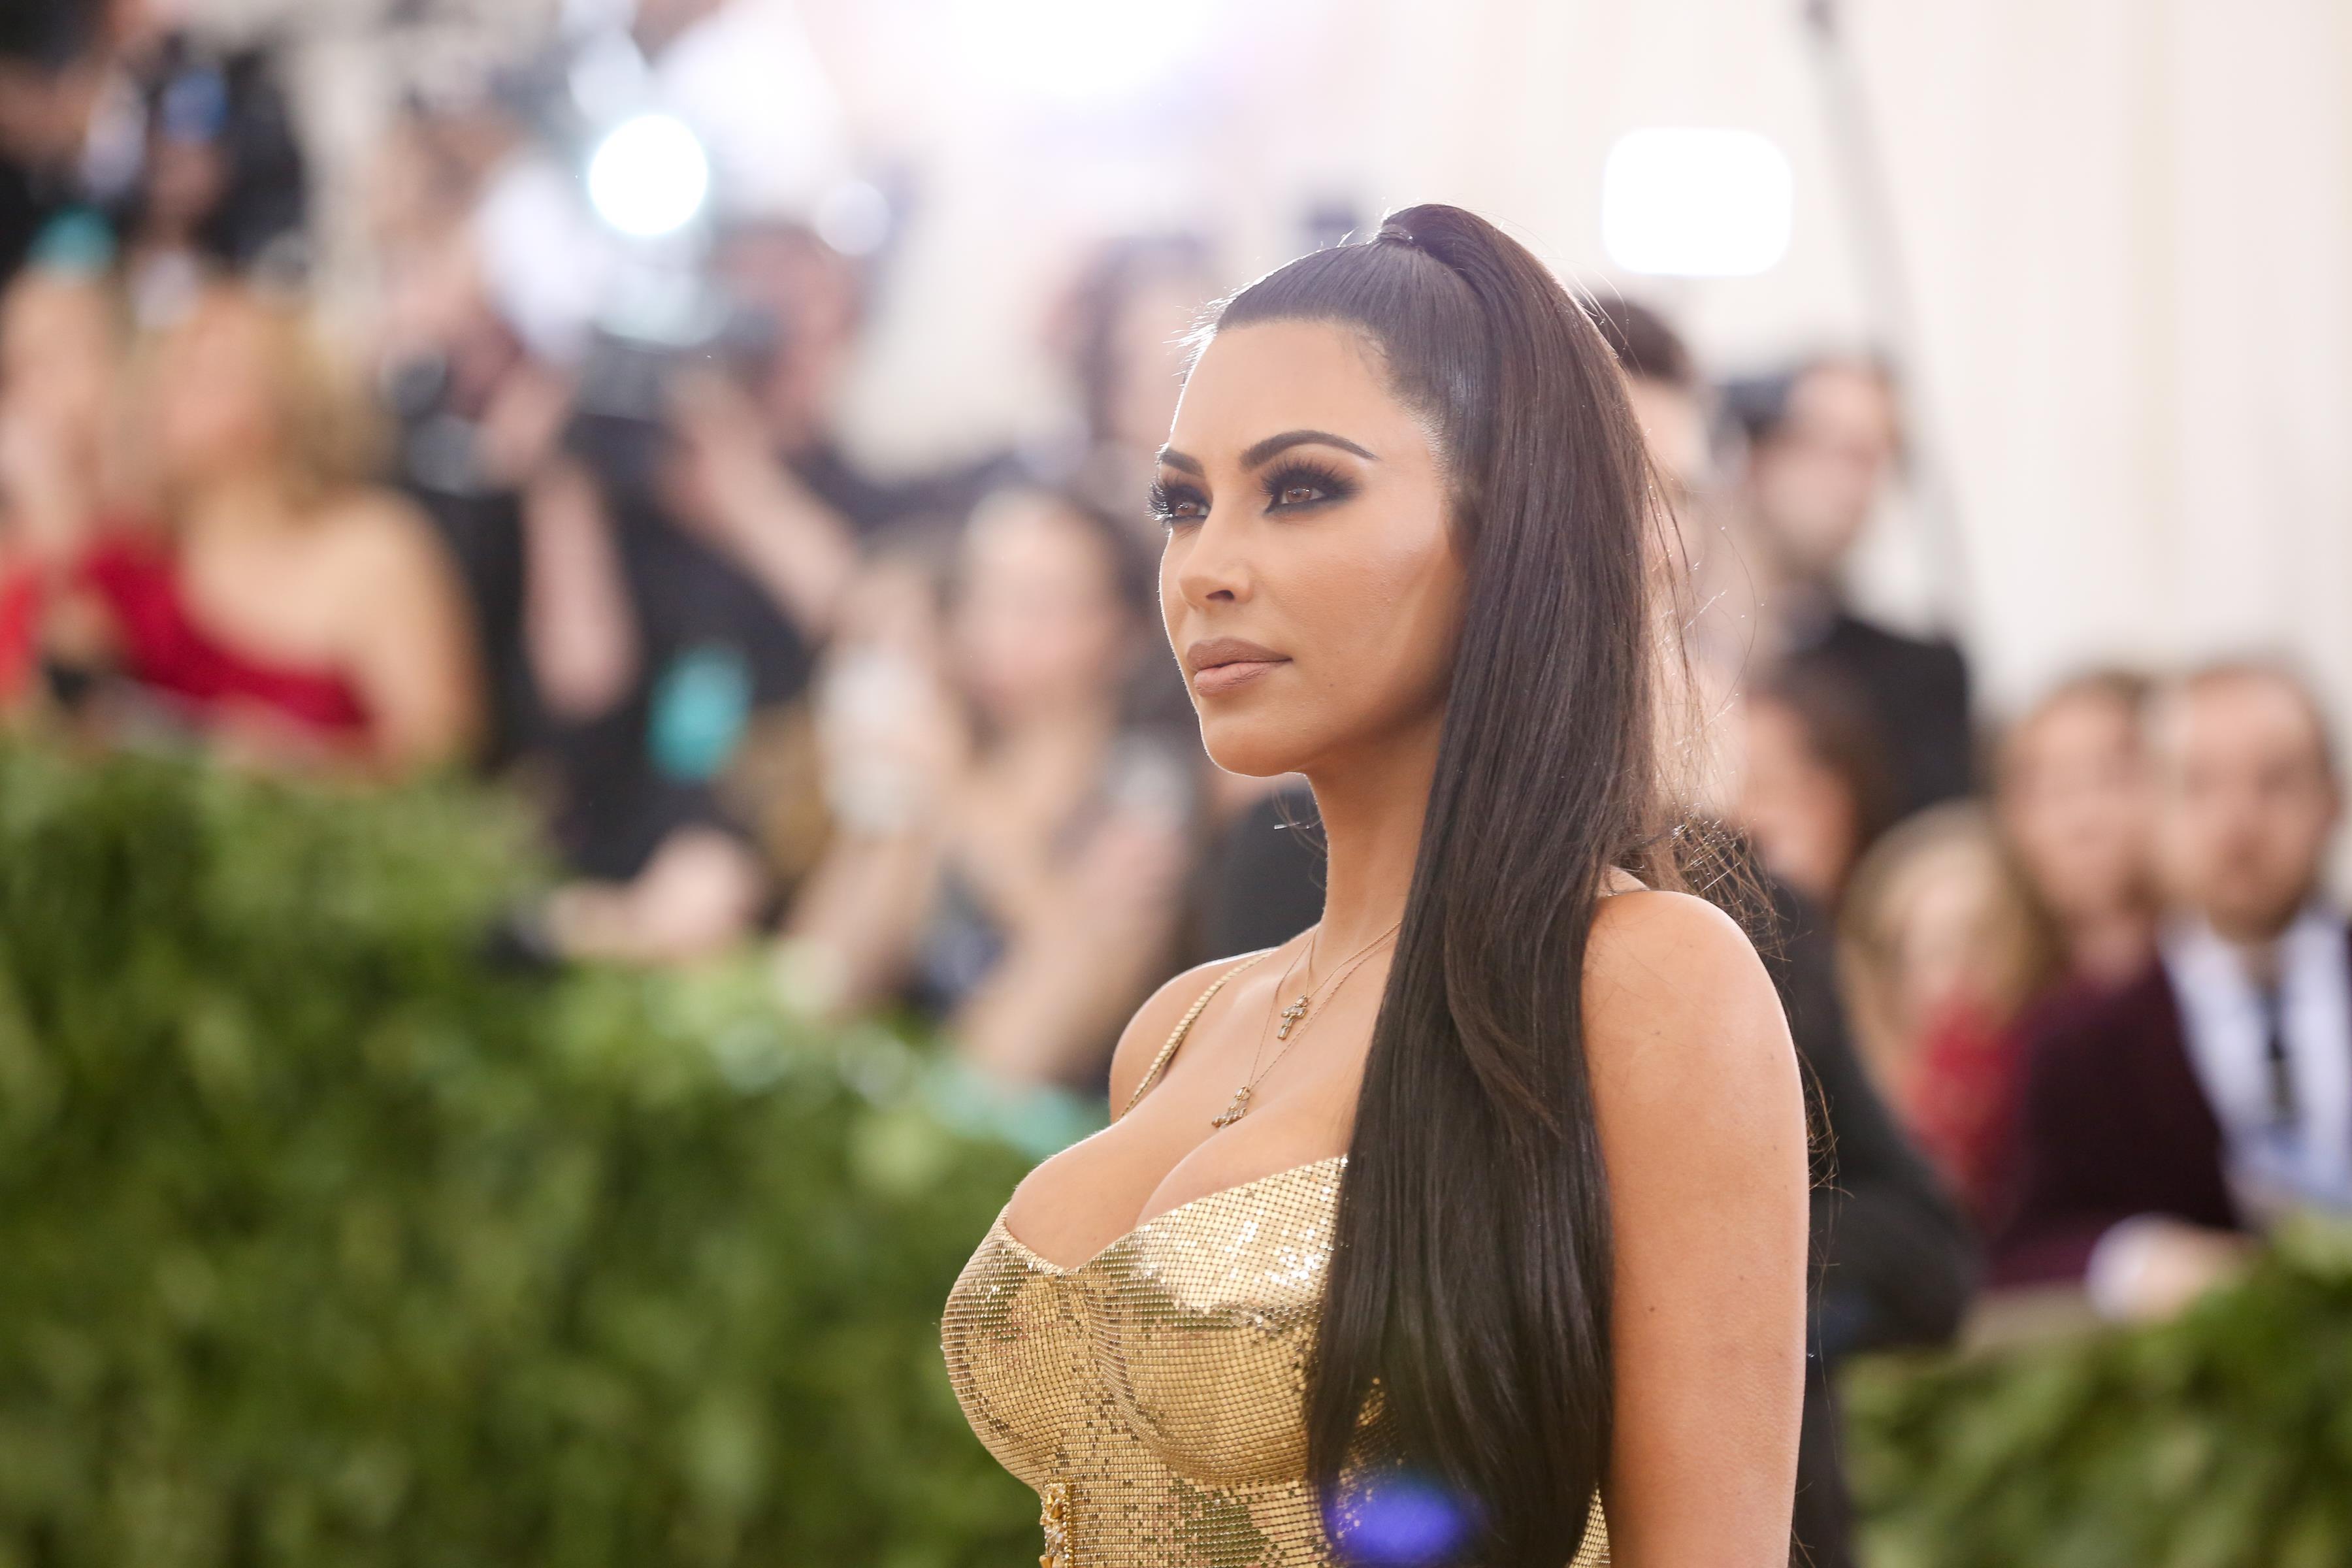 d7645f416a74 Kim Kardashian West on Influence in the Digital Age